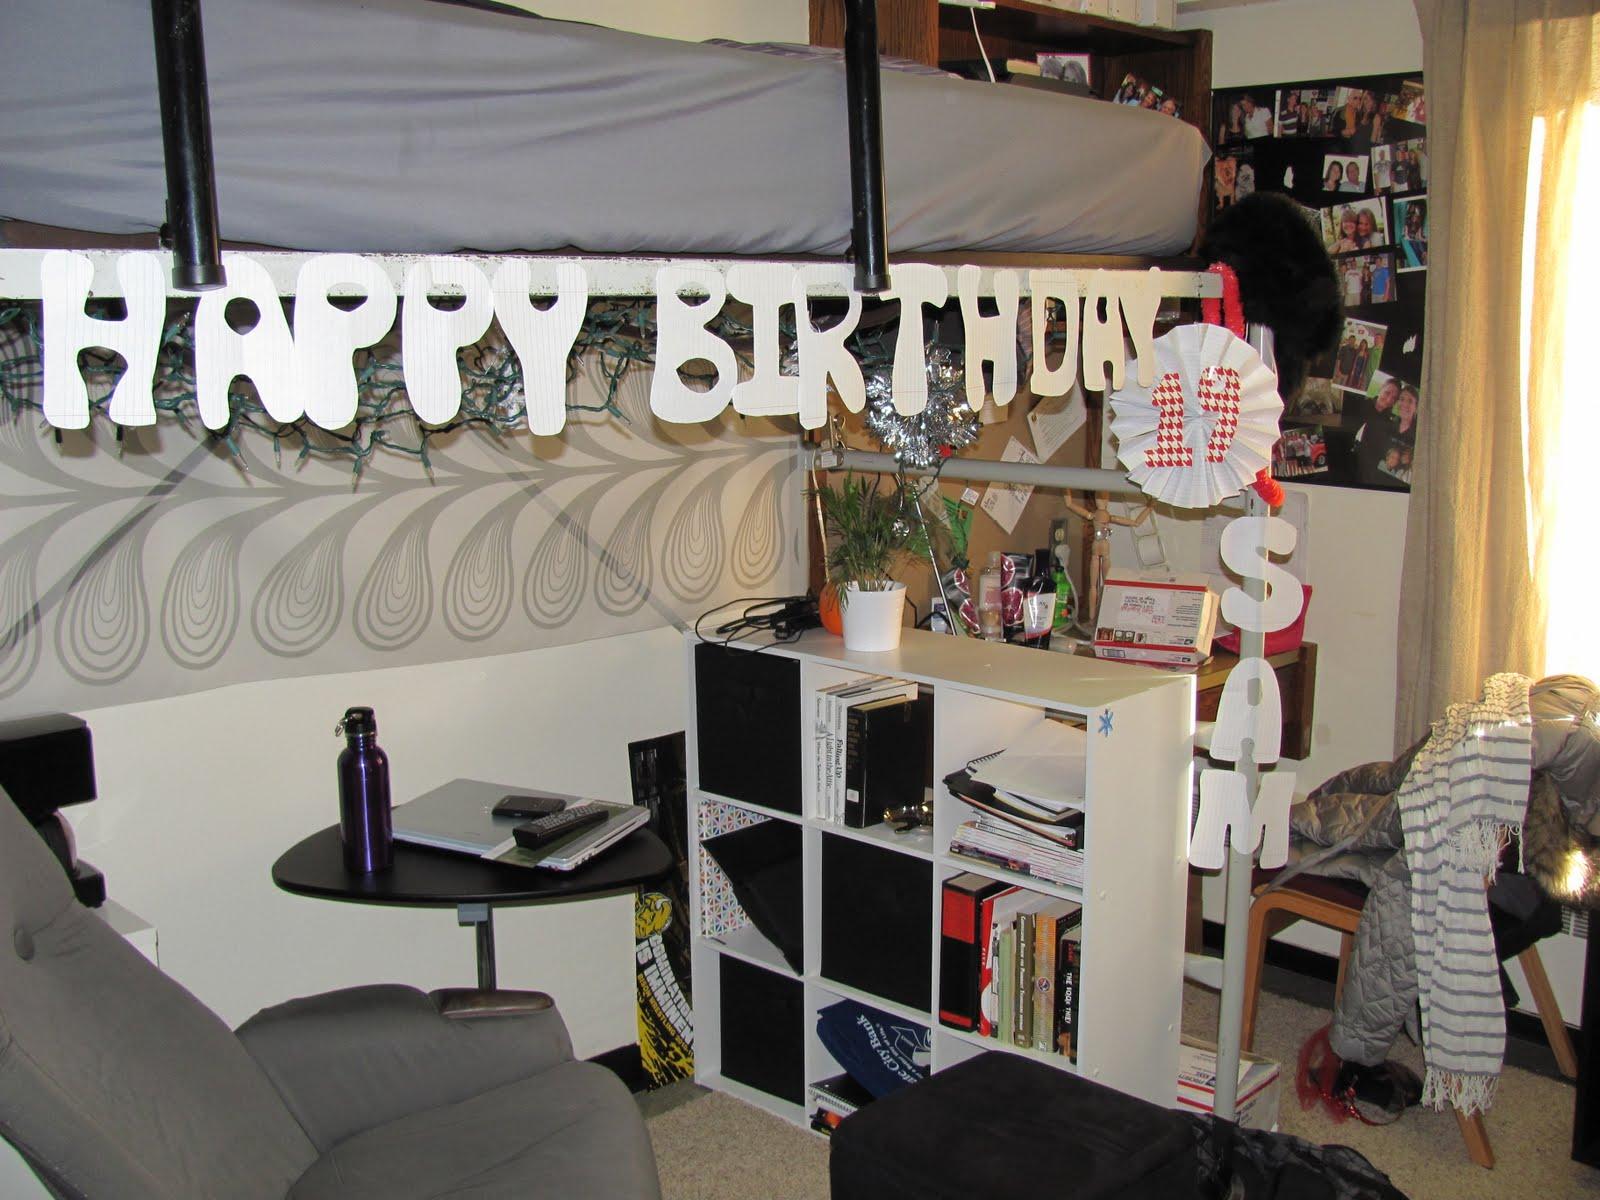 Beautiful Dorm Room Birthday Decorations Photo Gallery